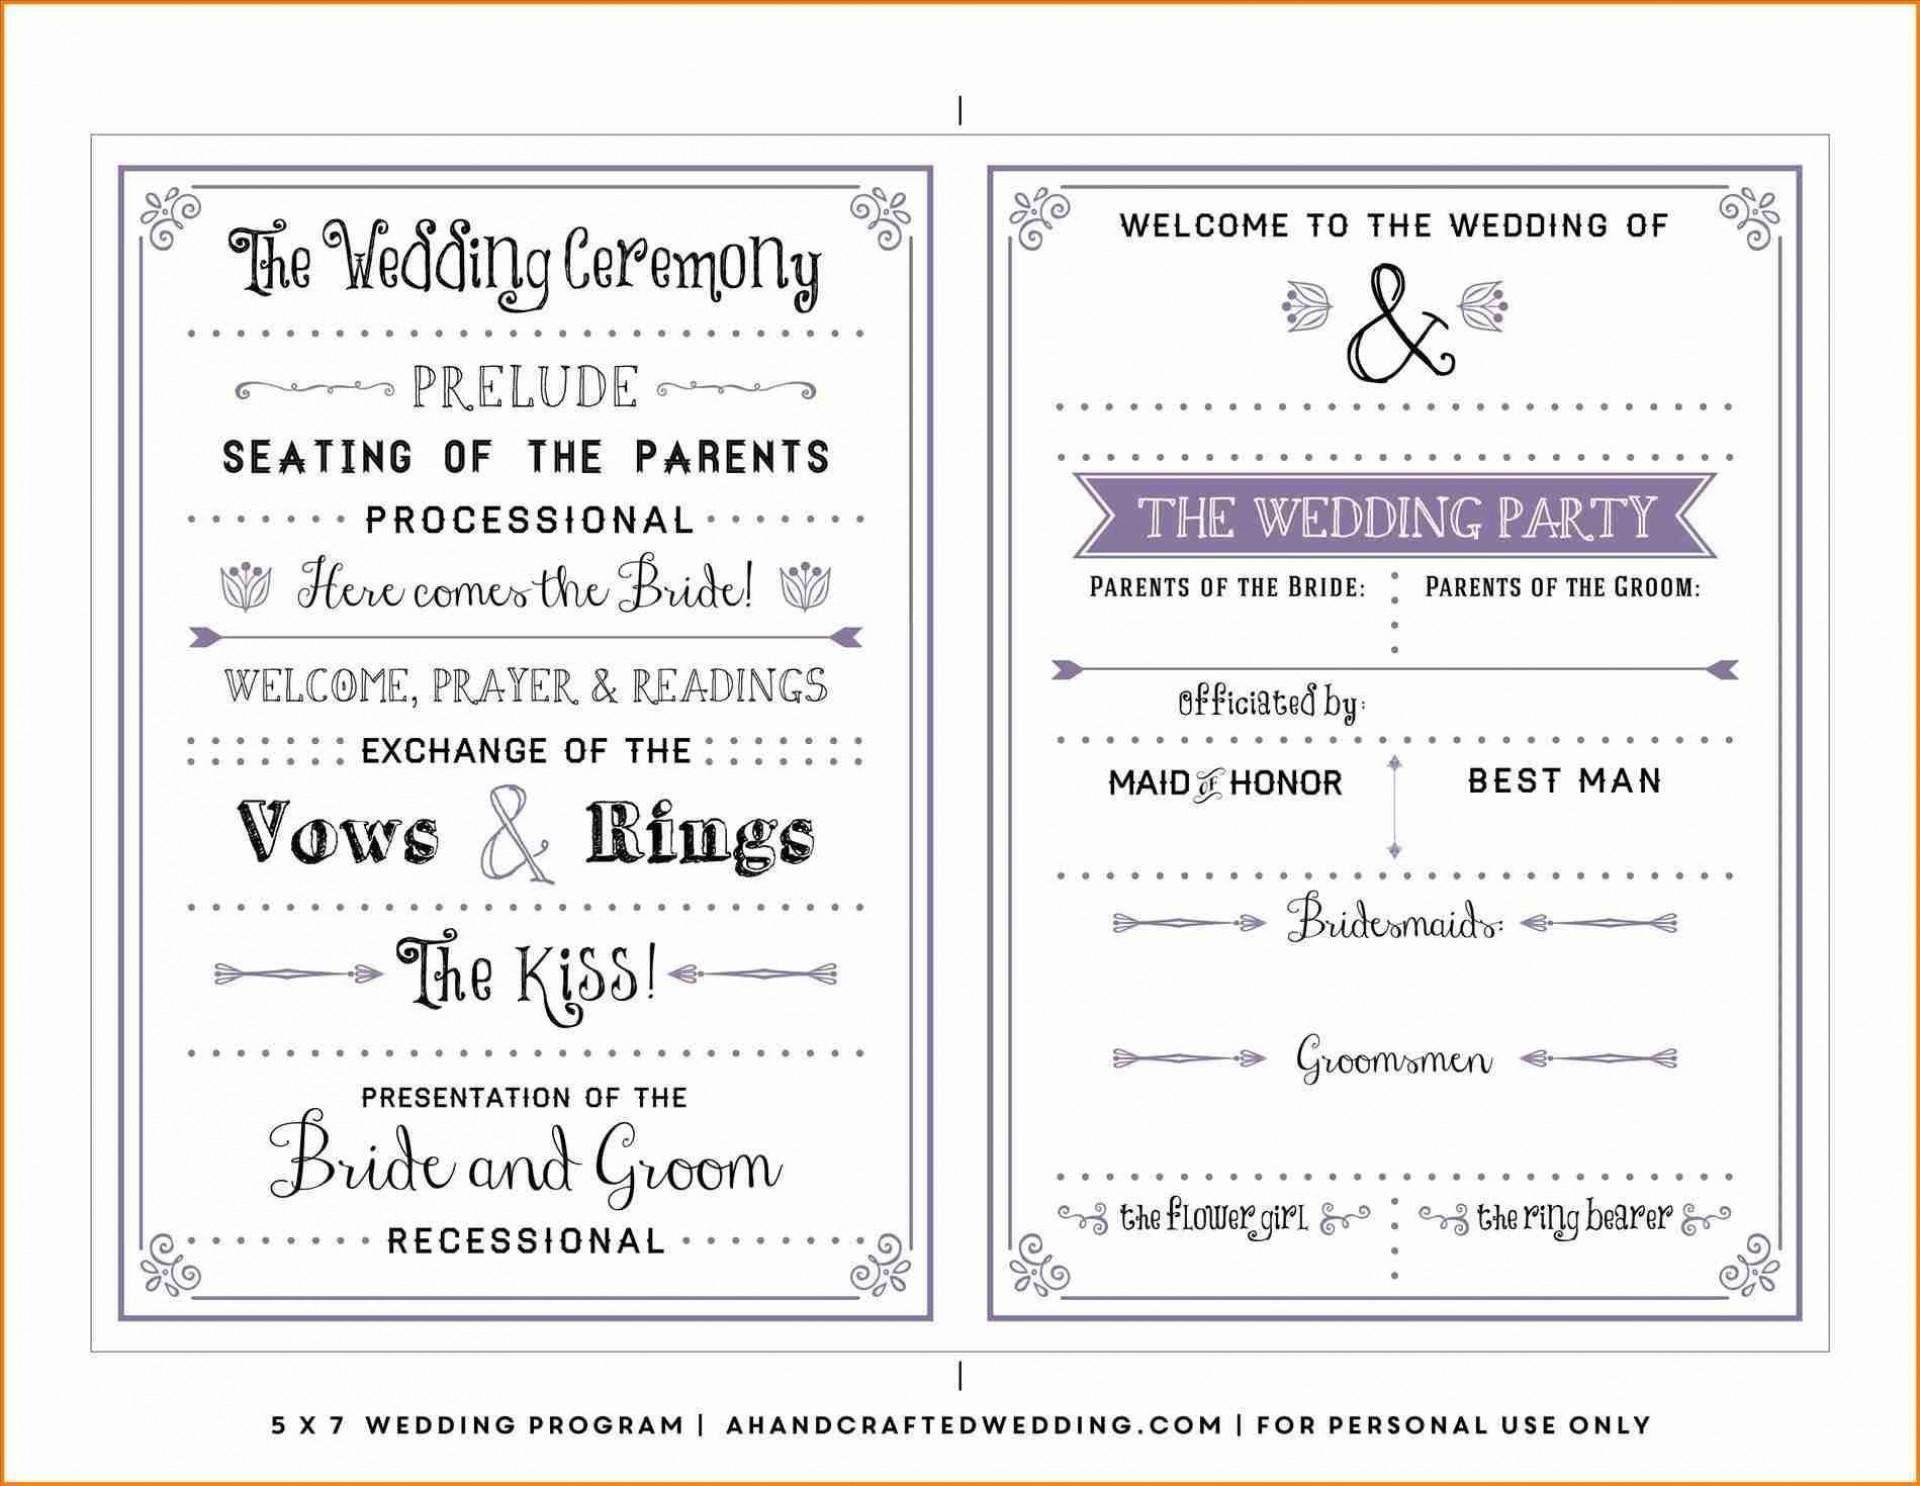 000 Staggering Wedding Program Template Word Design  Catholic Mas Sample Wording Idea Example Simple1920